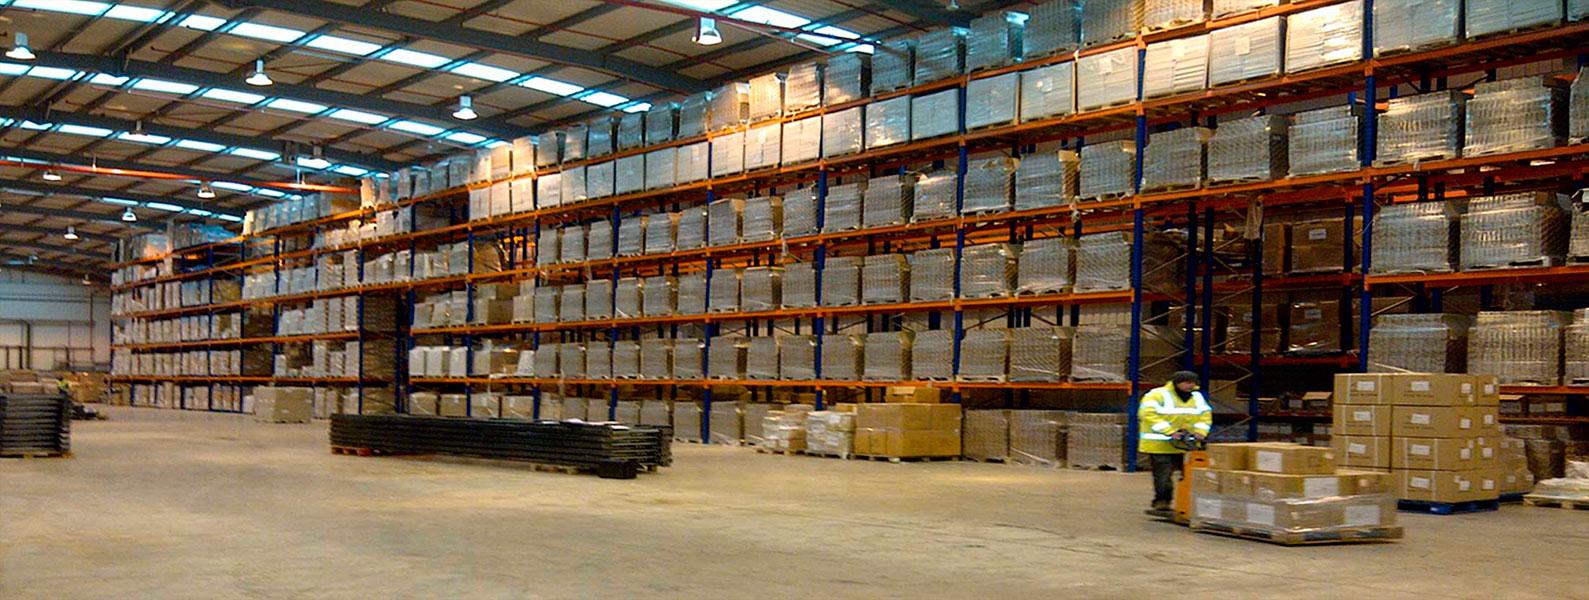 almacen, distribucion,, alquiler, espacio, agencia aduanal, importar, exportar